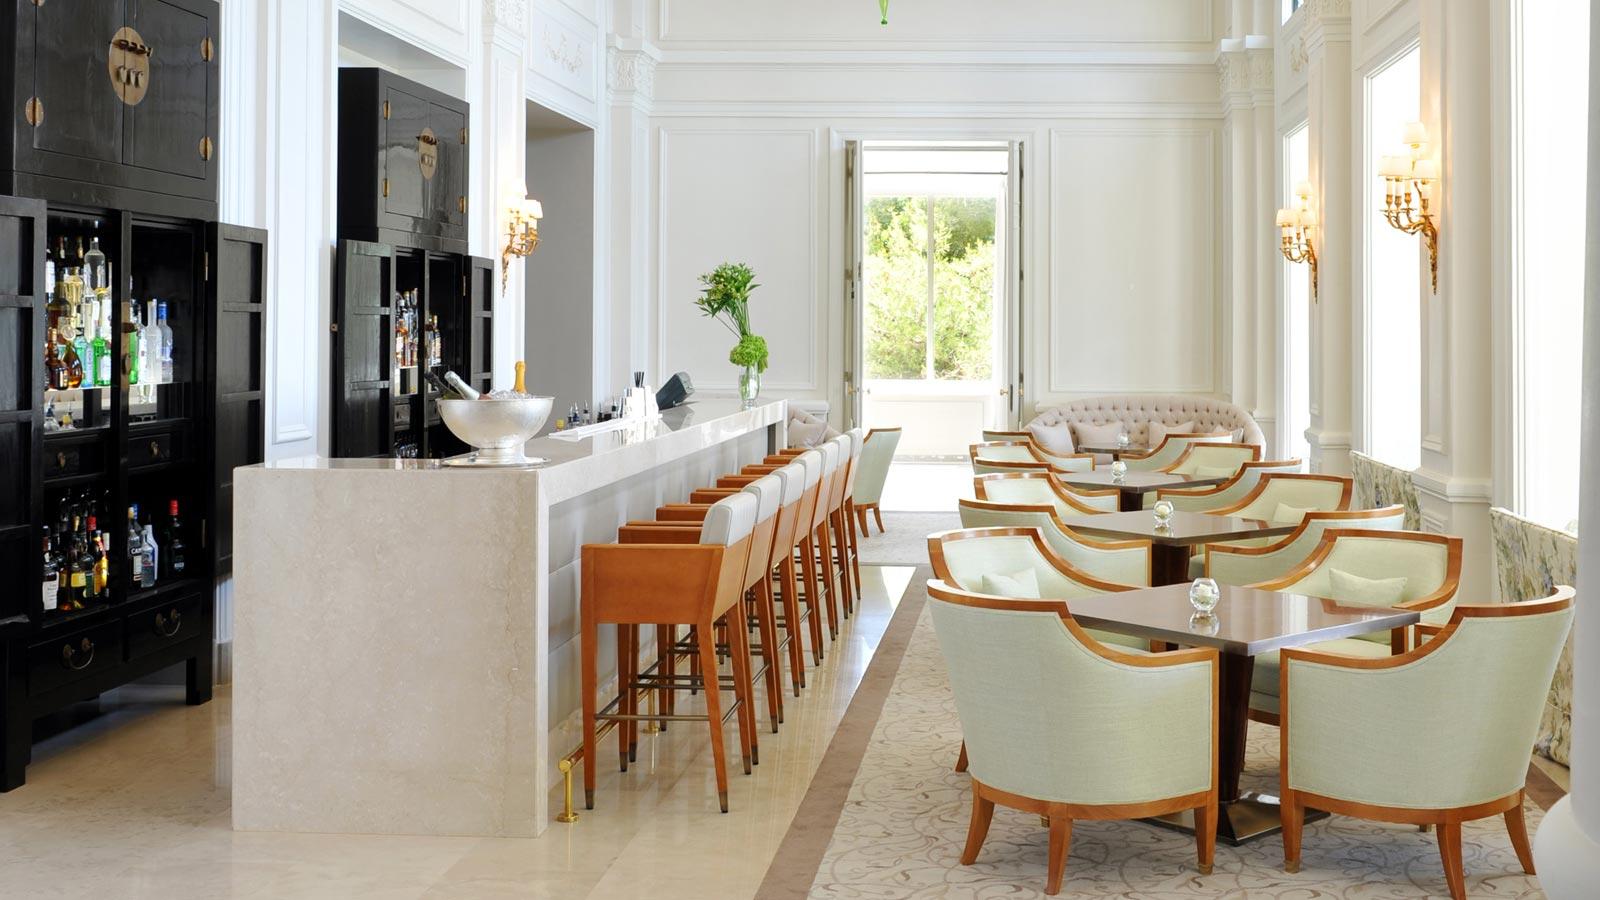 2488-so-2012galeriephotos-photorestaurants10-fr2.jpg